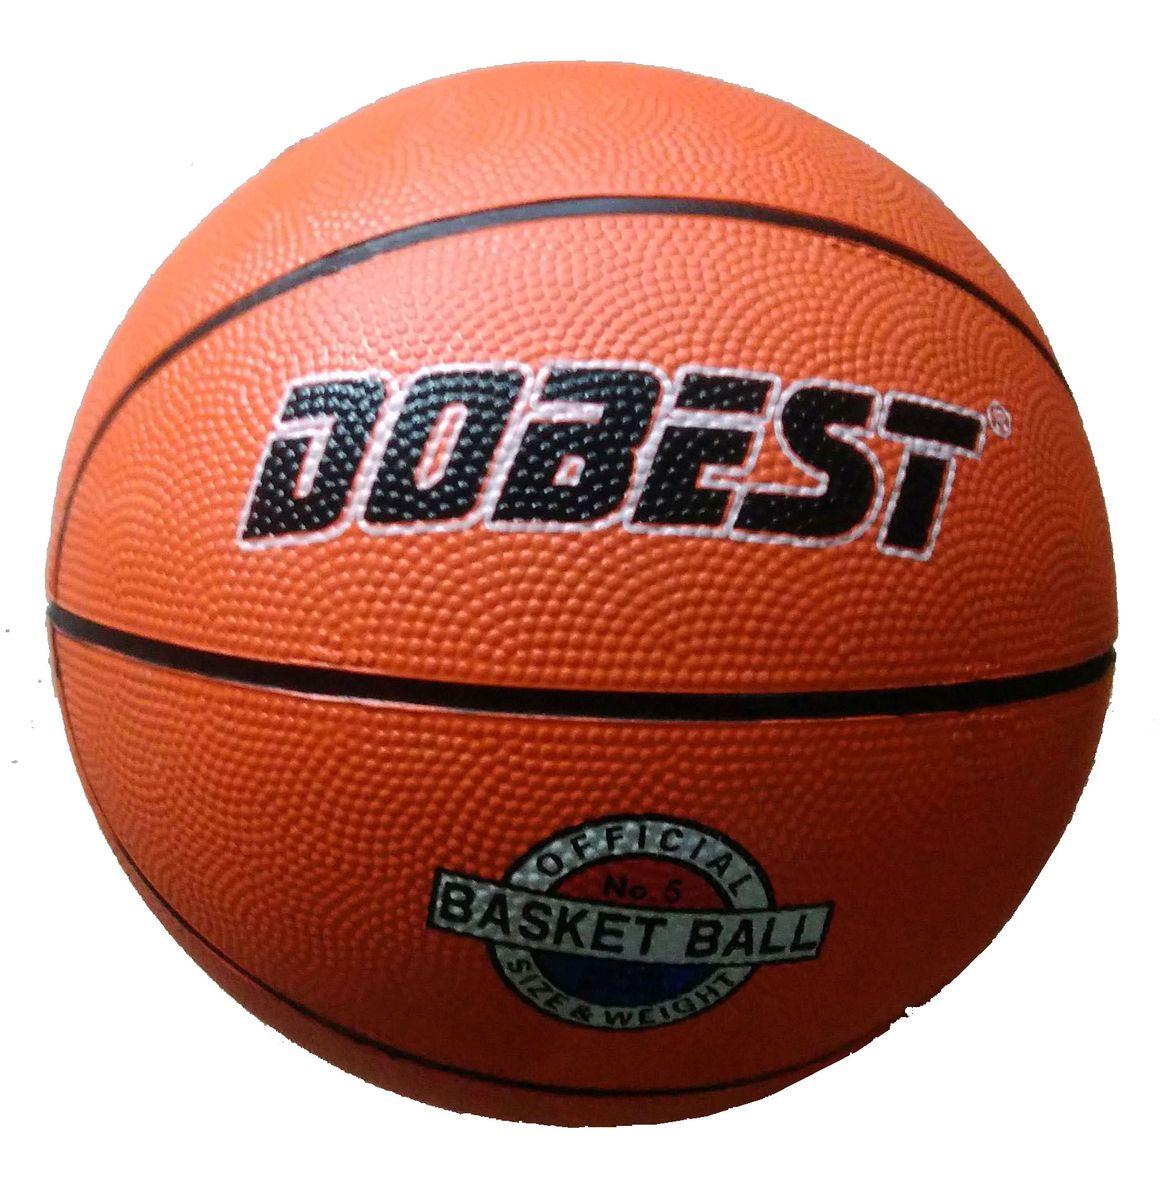 Мяч баскетбольный Dobest RB5, цвет: оранжевый. Размер 5 мяч для н т dobest ba 02 6шт уп